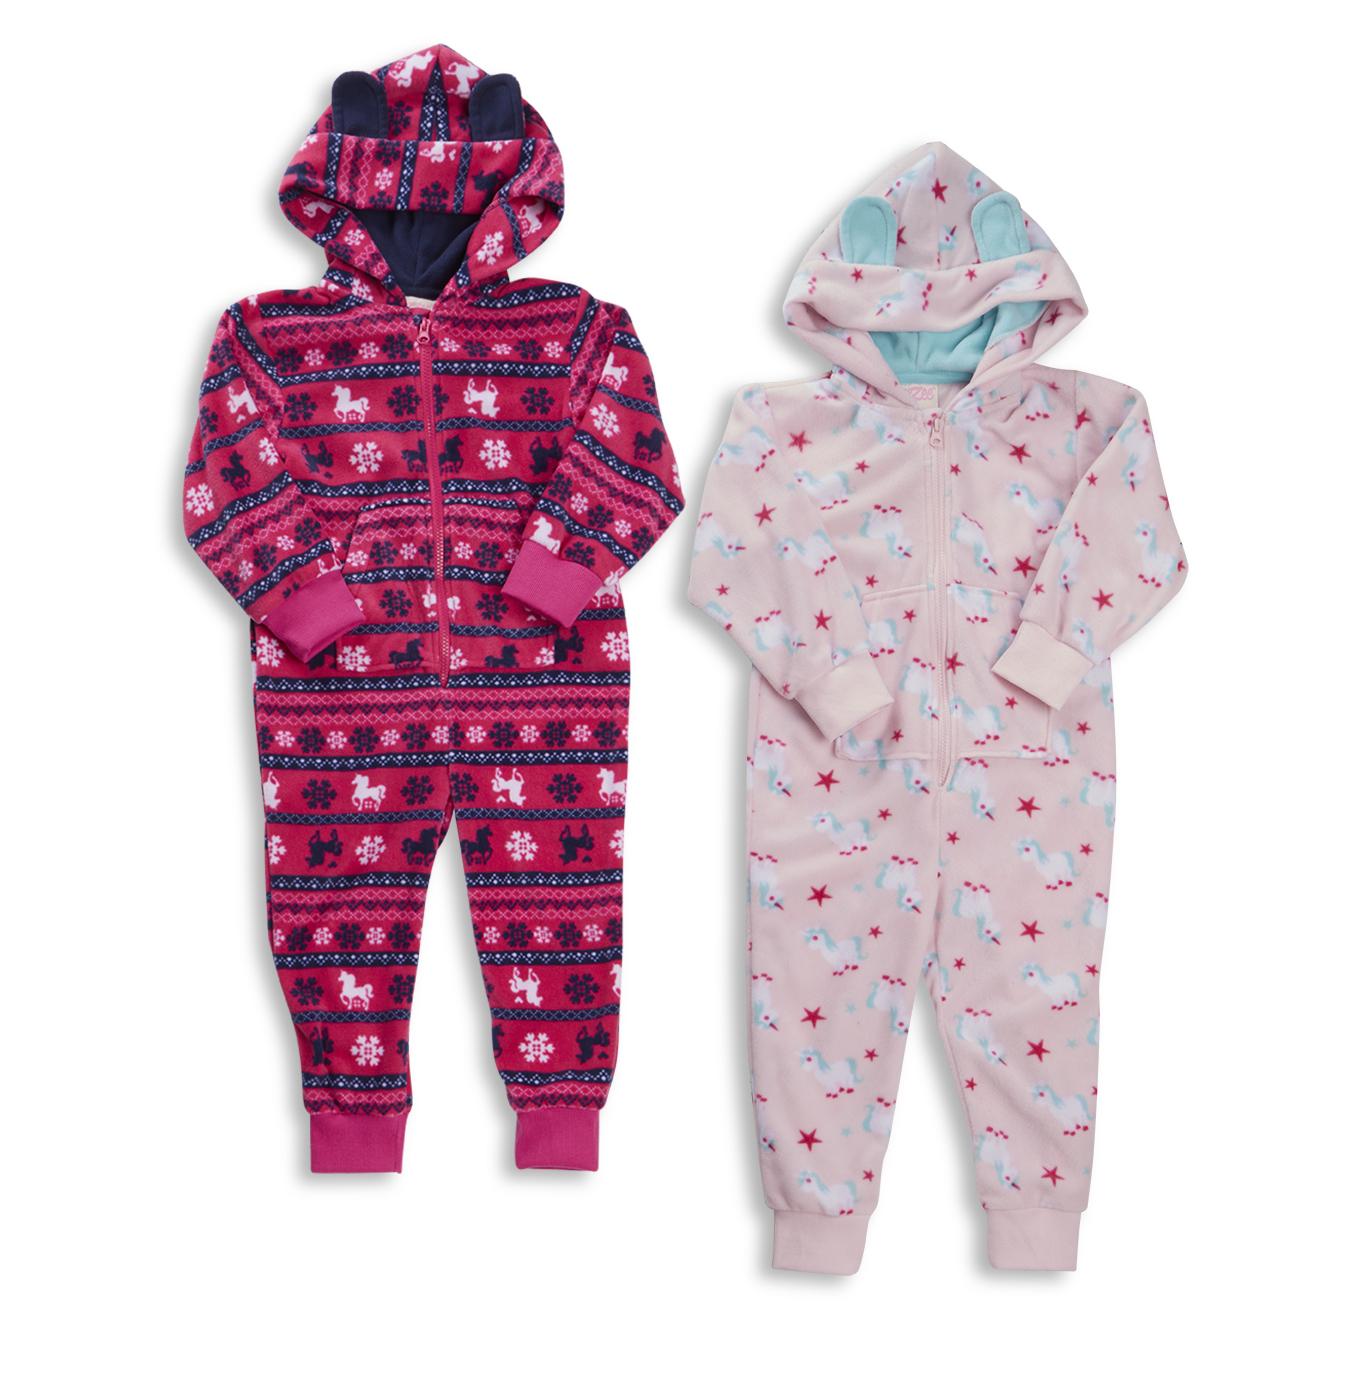 18c7e2360b34 Kids Infant Girls Pony Unicorn Hooded All In One Micro Fleece ...